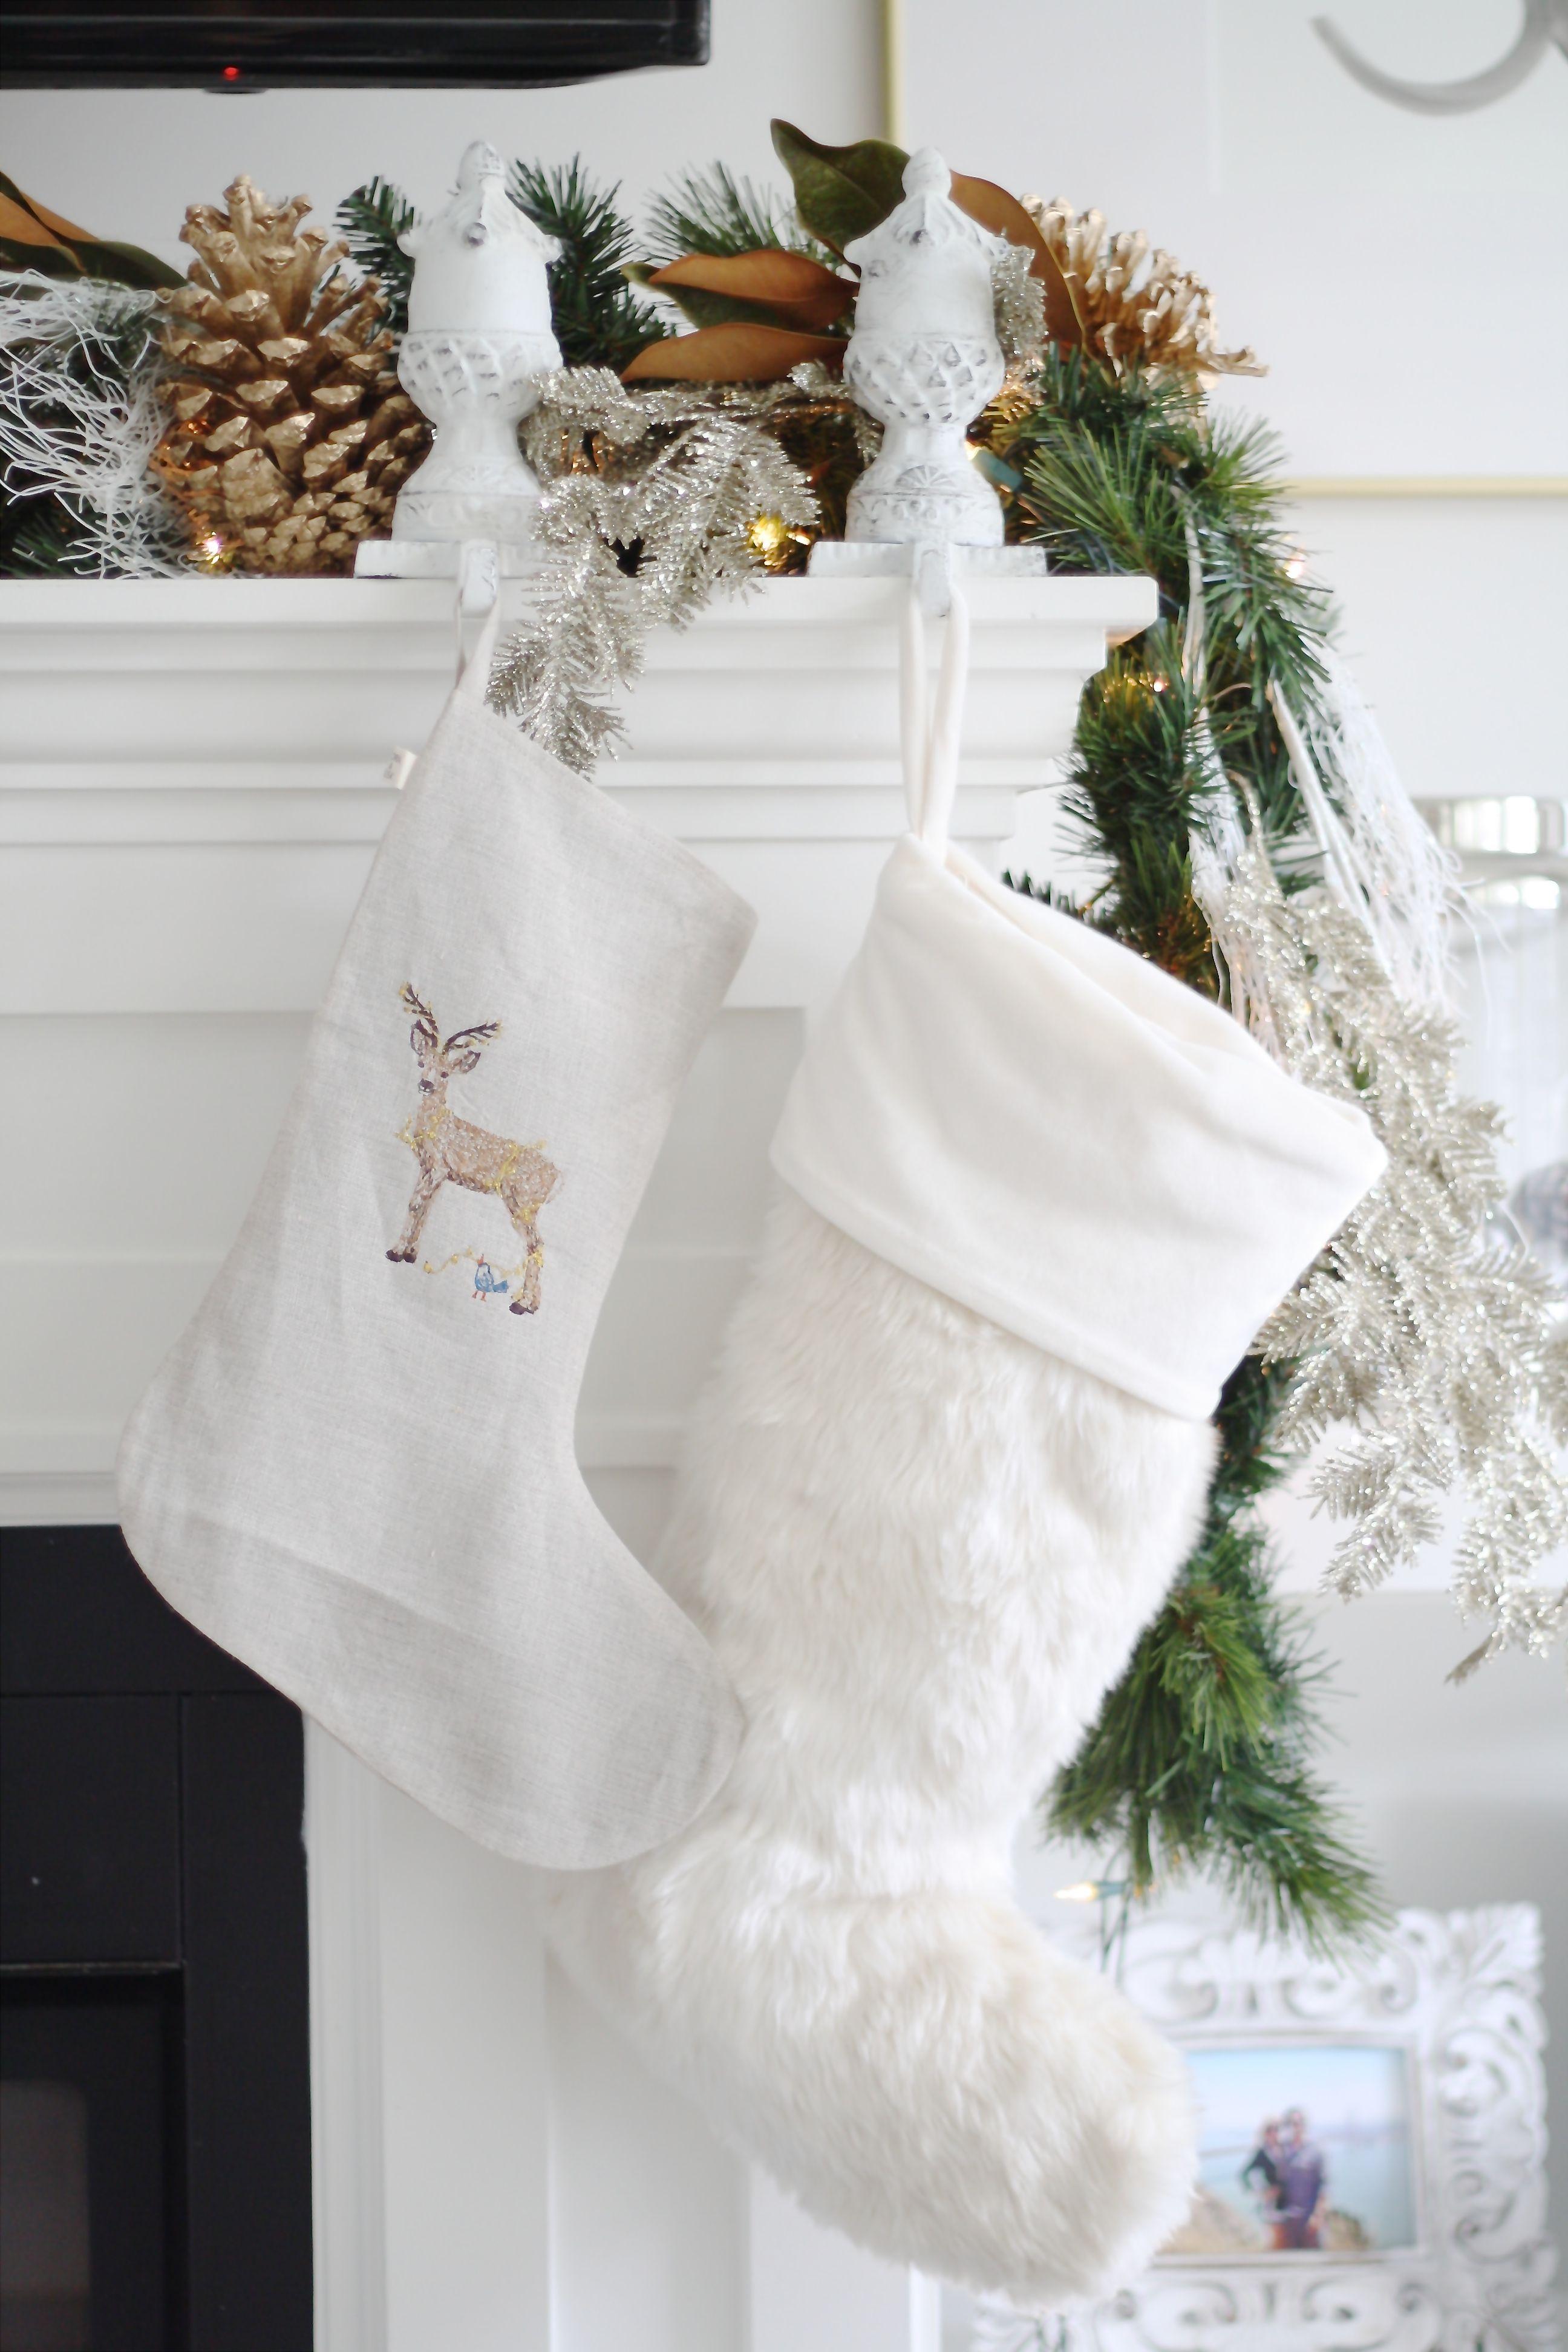 A Hibbs Christmas White Christmas Stockings Christmas Stockings